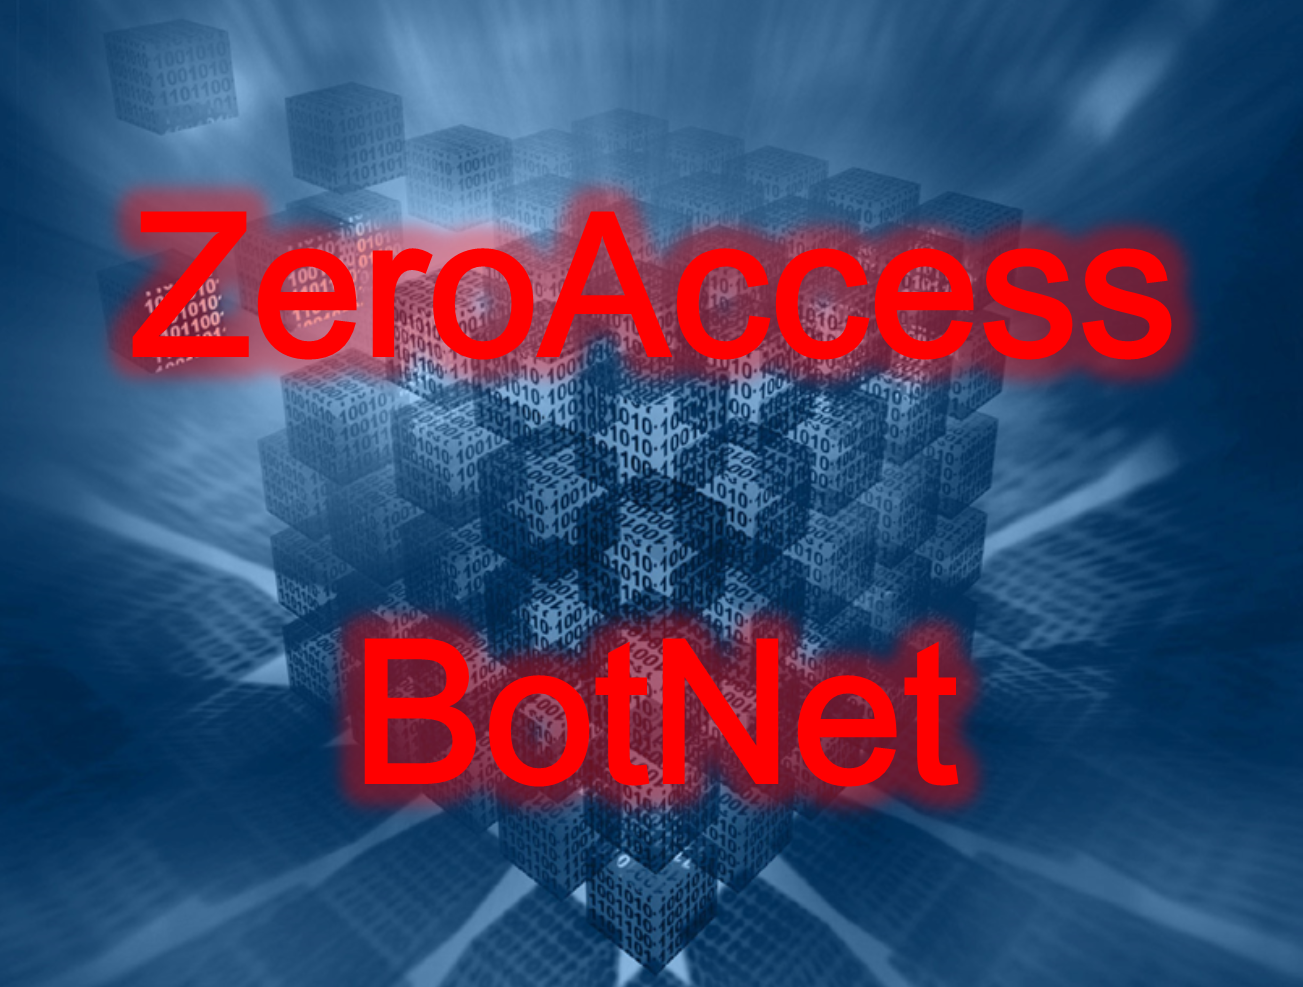 ZeroAccess_Botnet